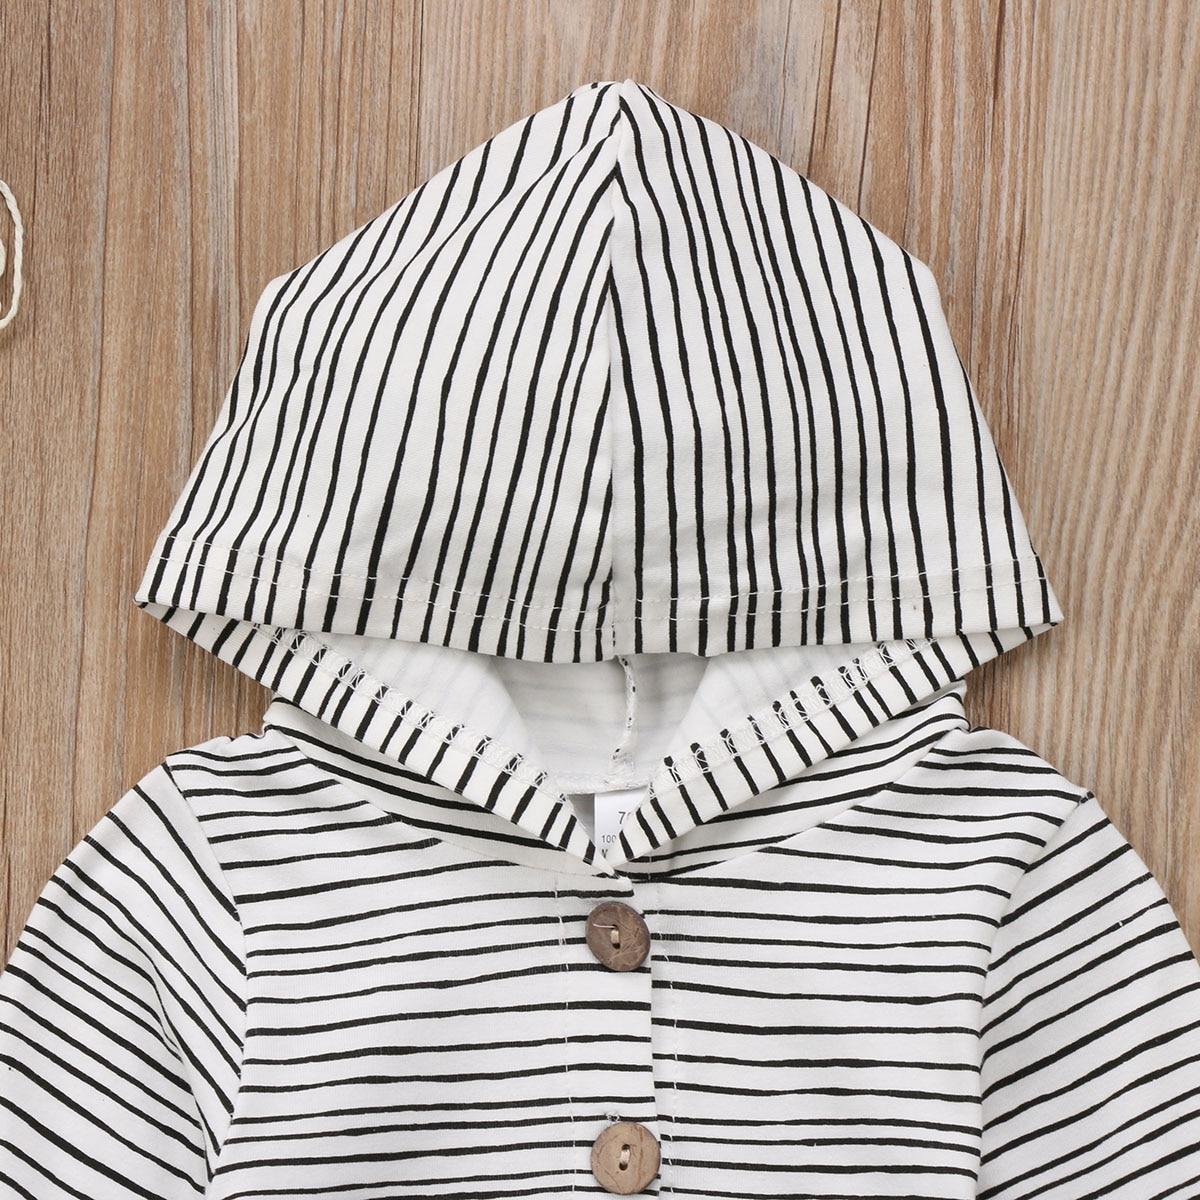 HTB1BzWSem I8KJjy0Foq6yFnVXaV 2018 Brand New Toddler Newborn Baby Boy Girl Warm Infant Romper Striped Jumpsuit Hooded Clothes Long Sleeve Outfit